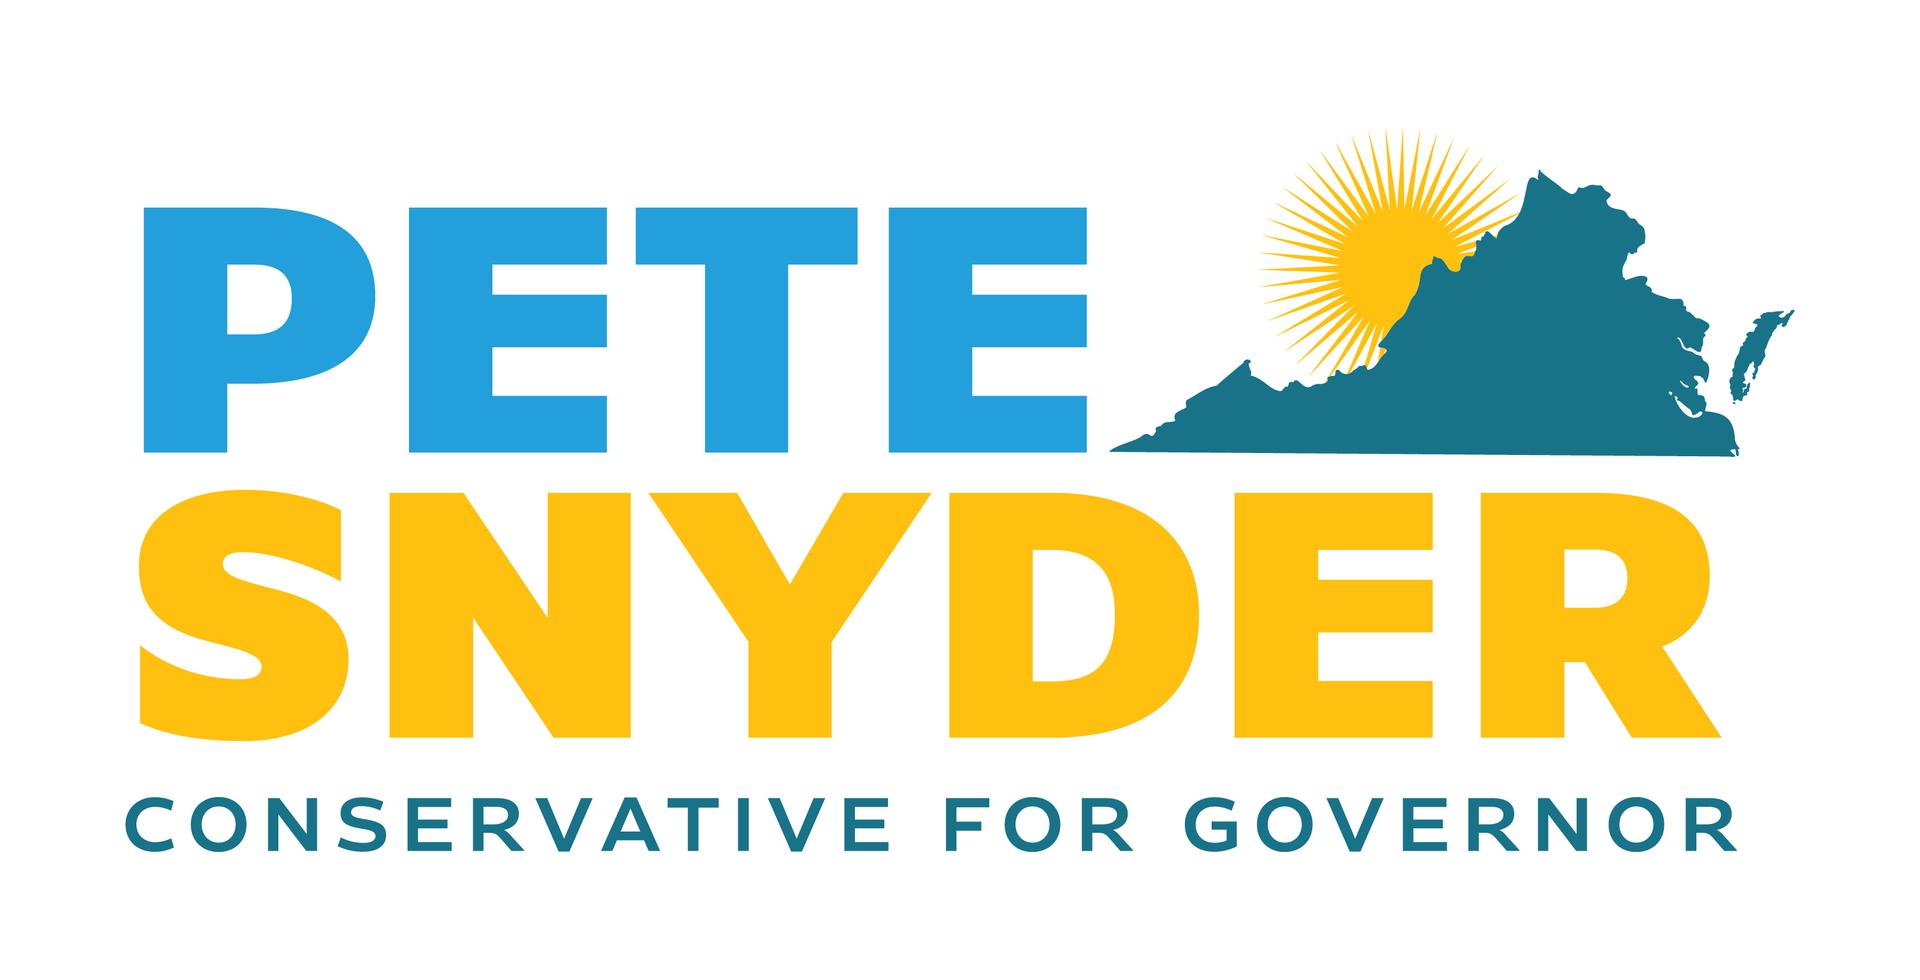 Pete snyder logo